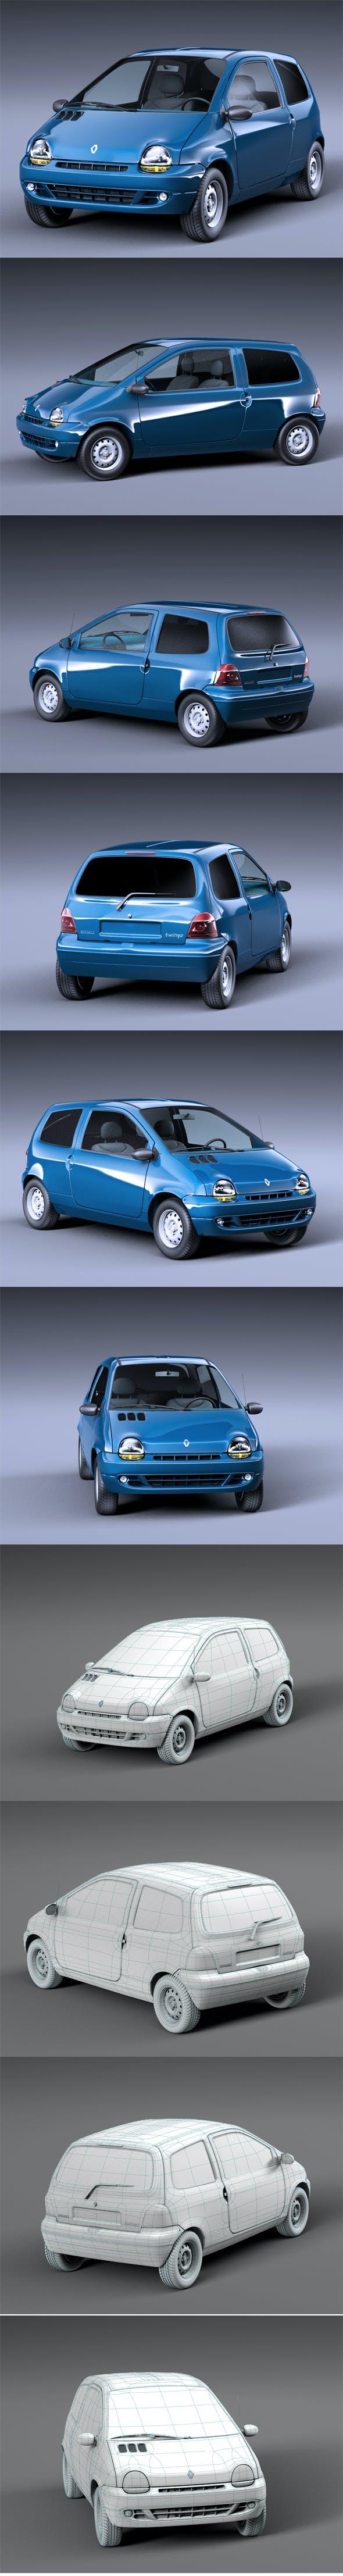 Renault Twingo 1993 - 3DOcean Item for Sale